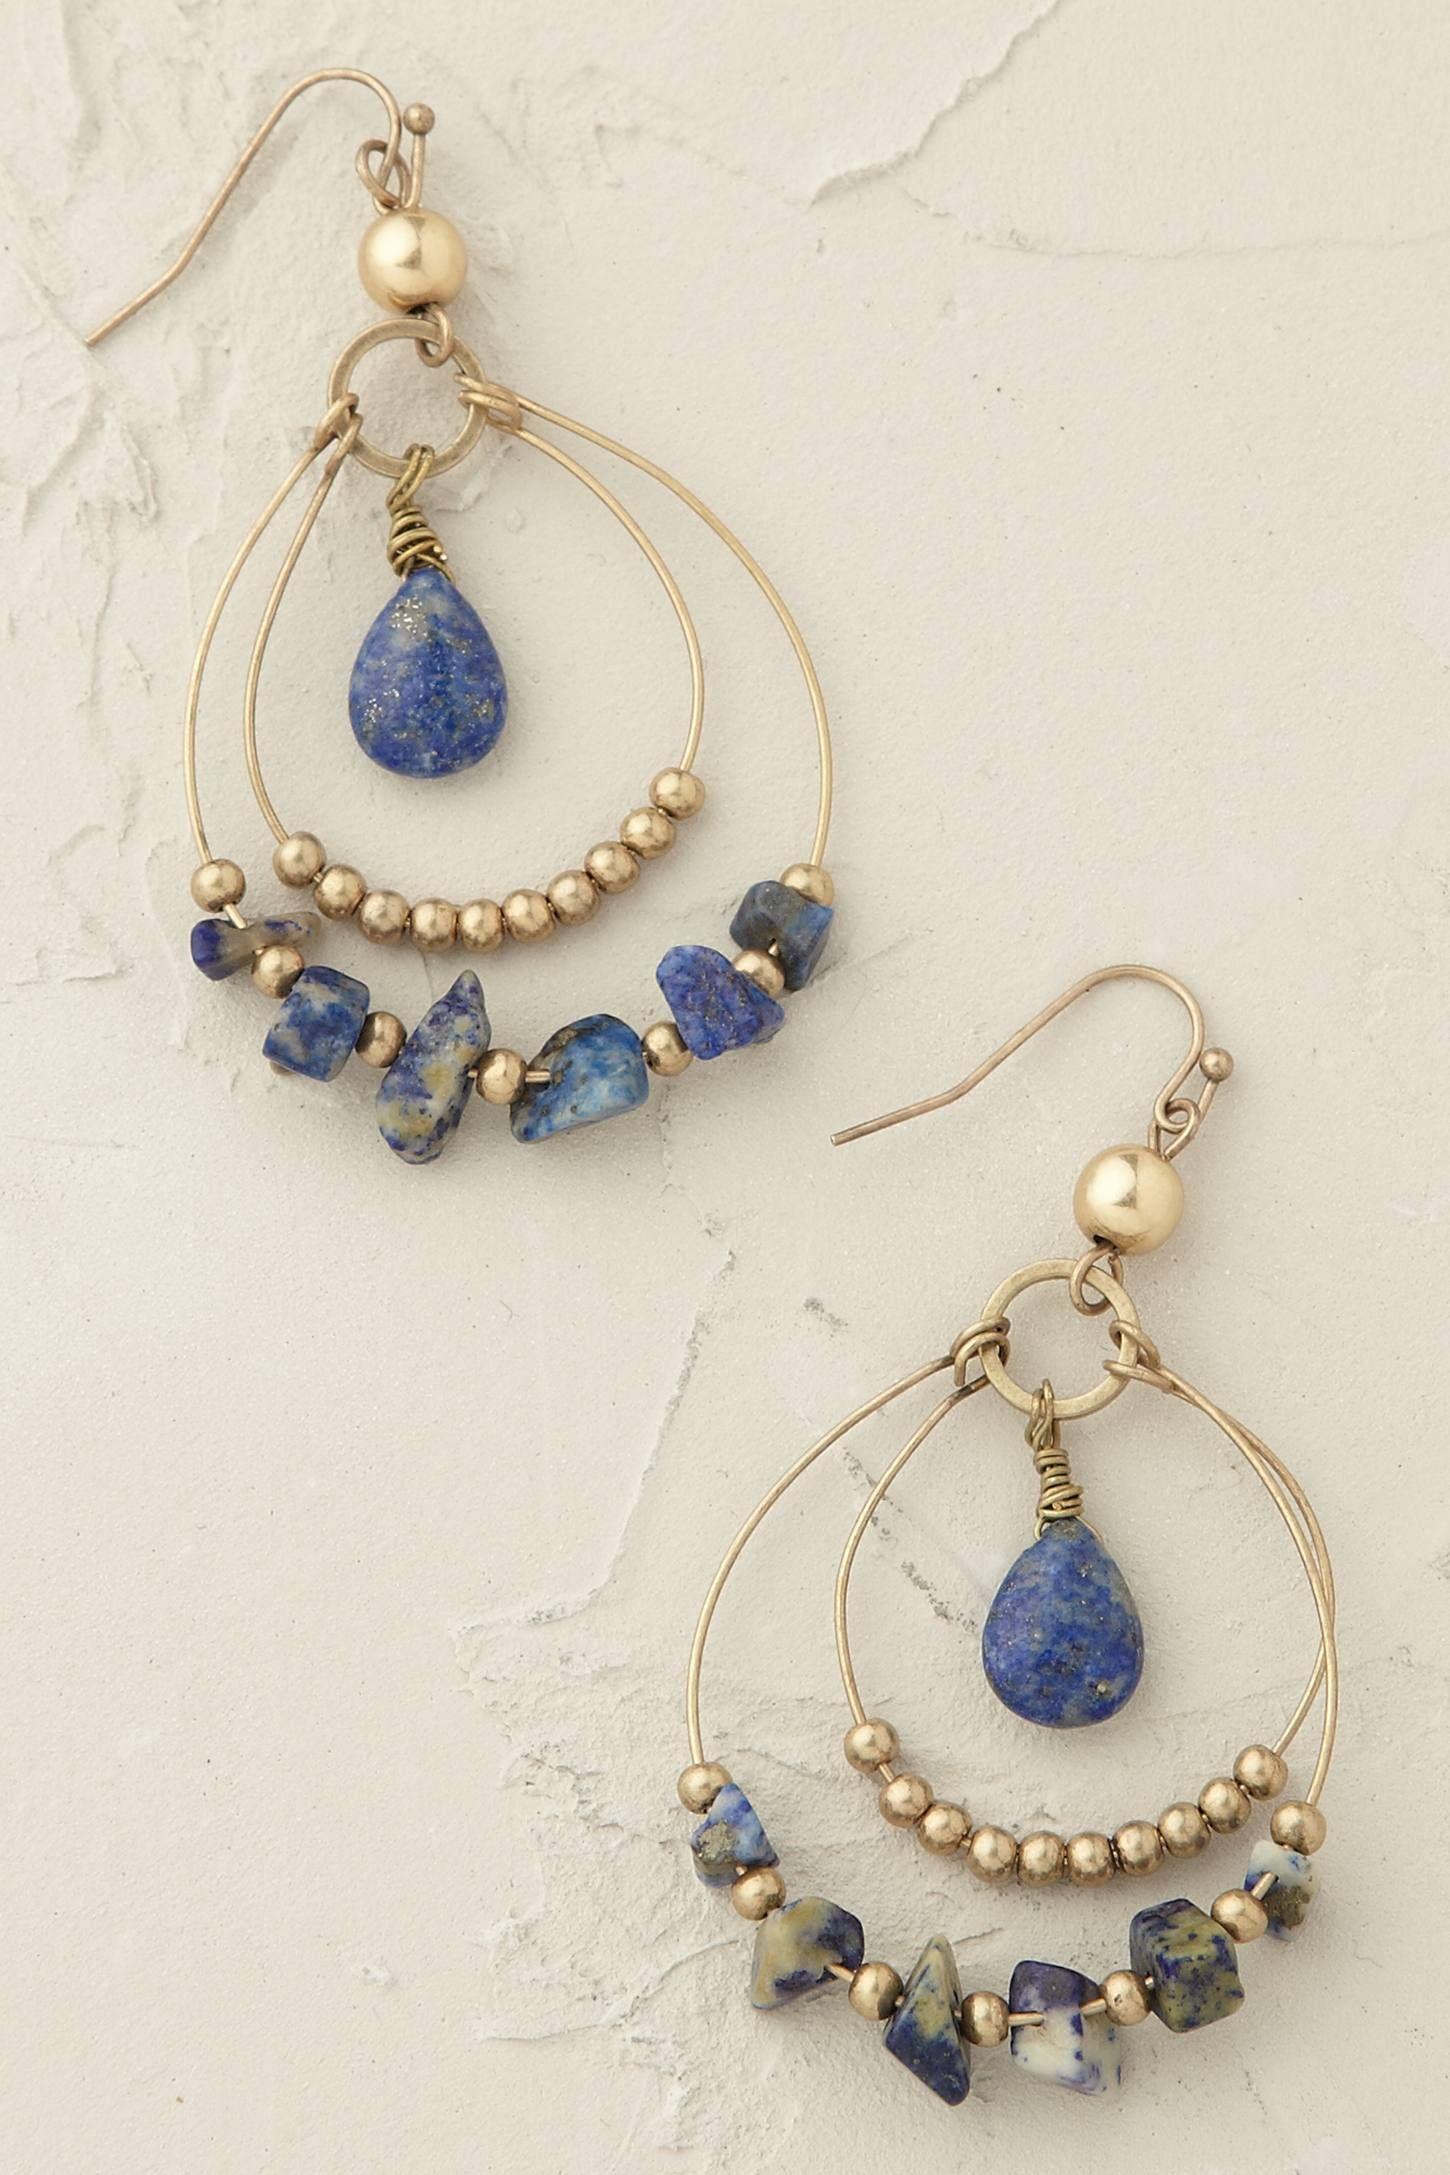 belize hoop earrings - anthropologie.eu | jewelry & accessories